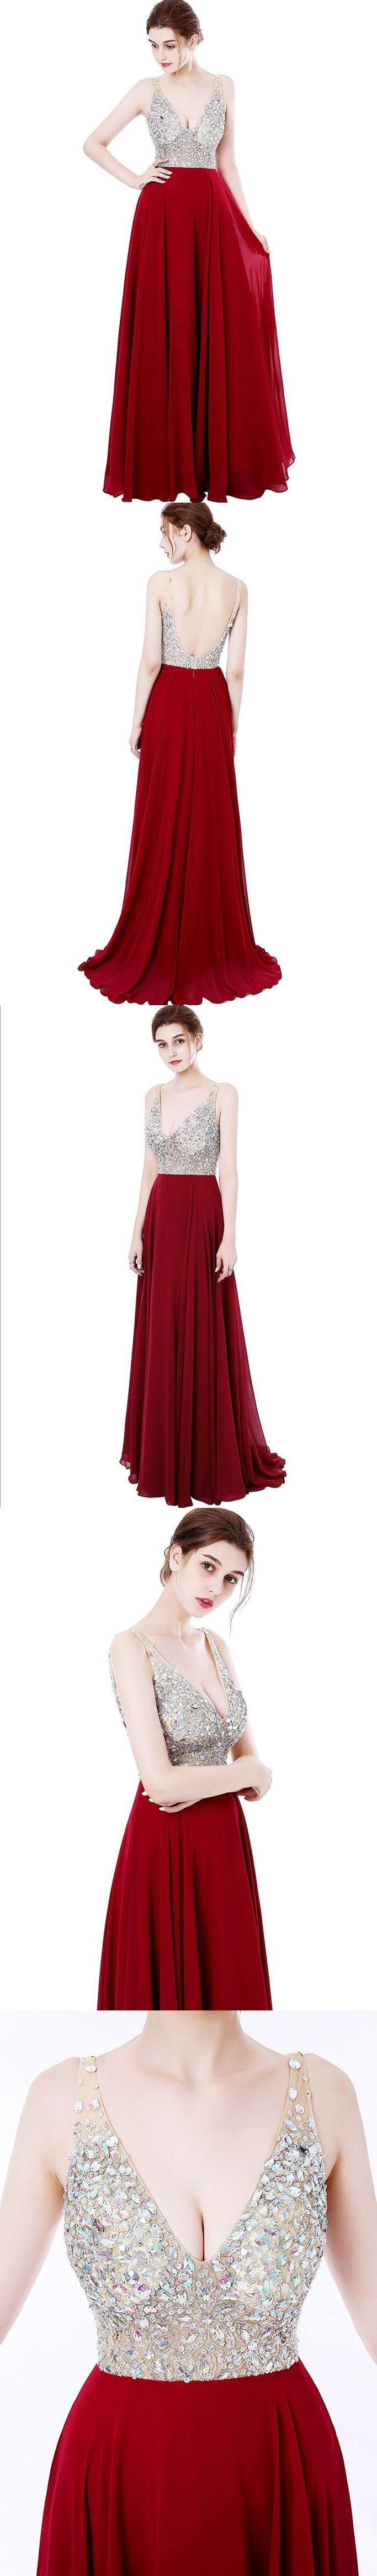 Dark Red Chiffon Beaded Top Long Prom Dresses,Pageant Dresses,2018 Prom Dresses,Long Bridesmaid Dresses #sheergirl #prom